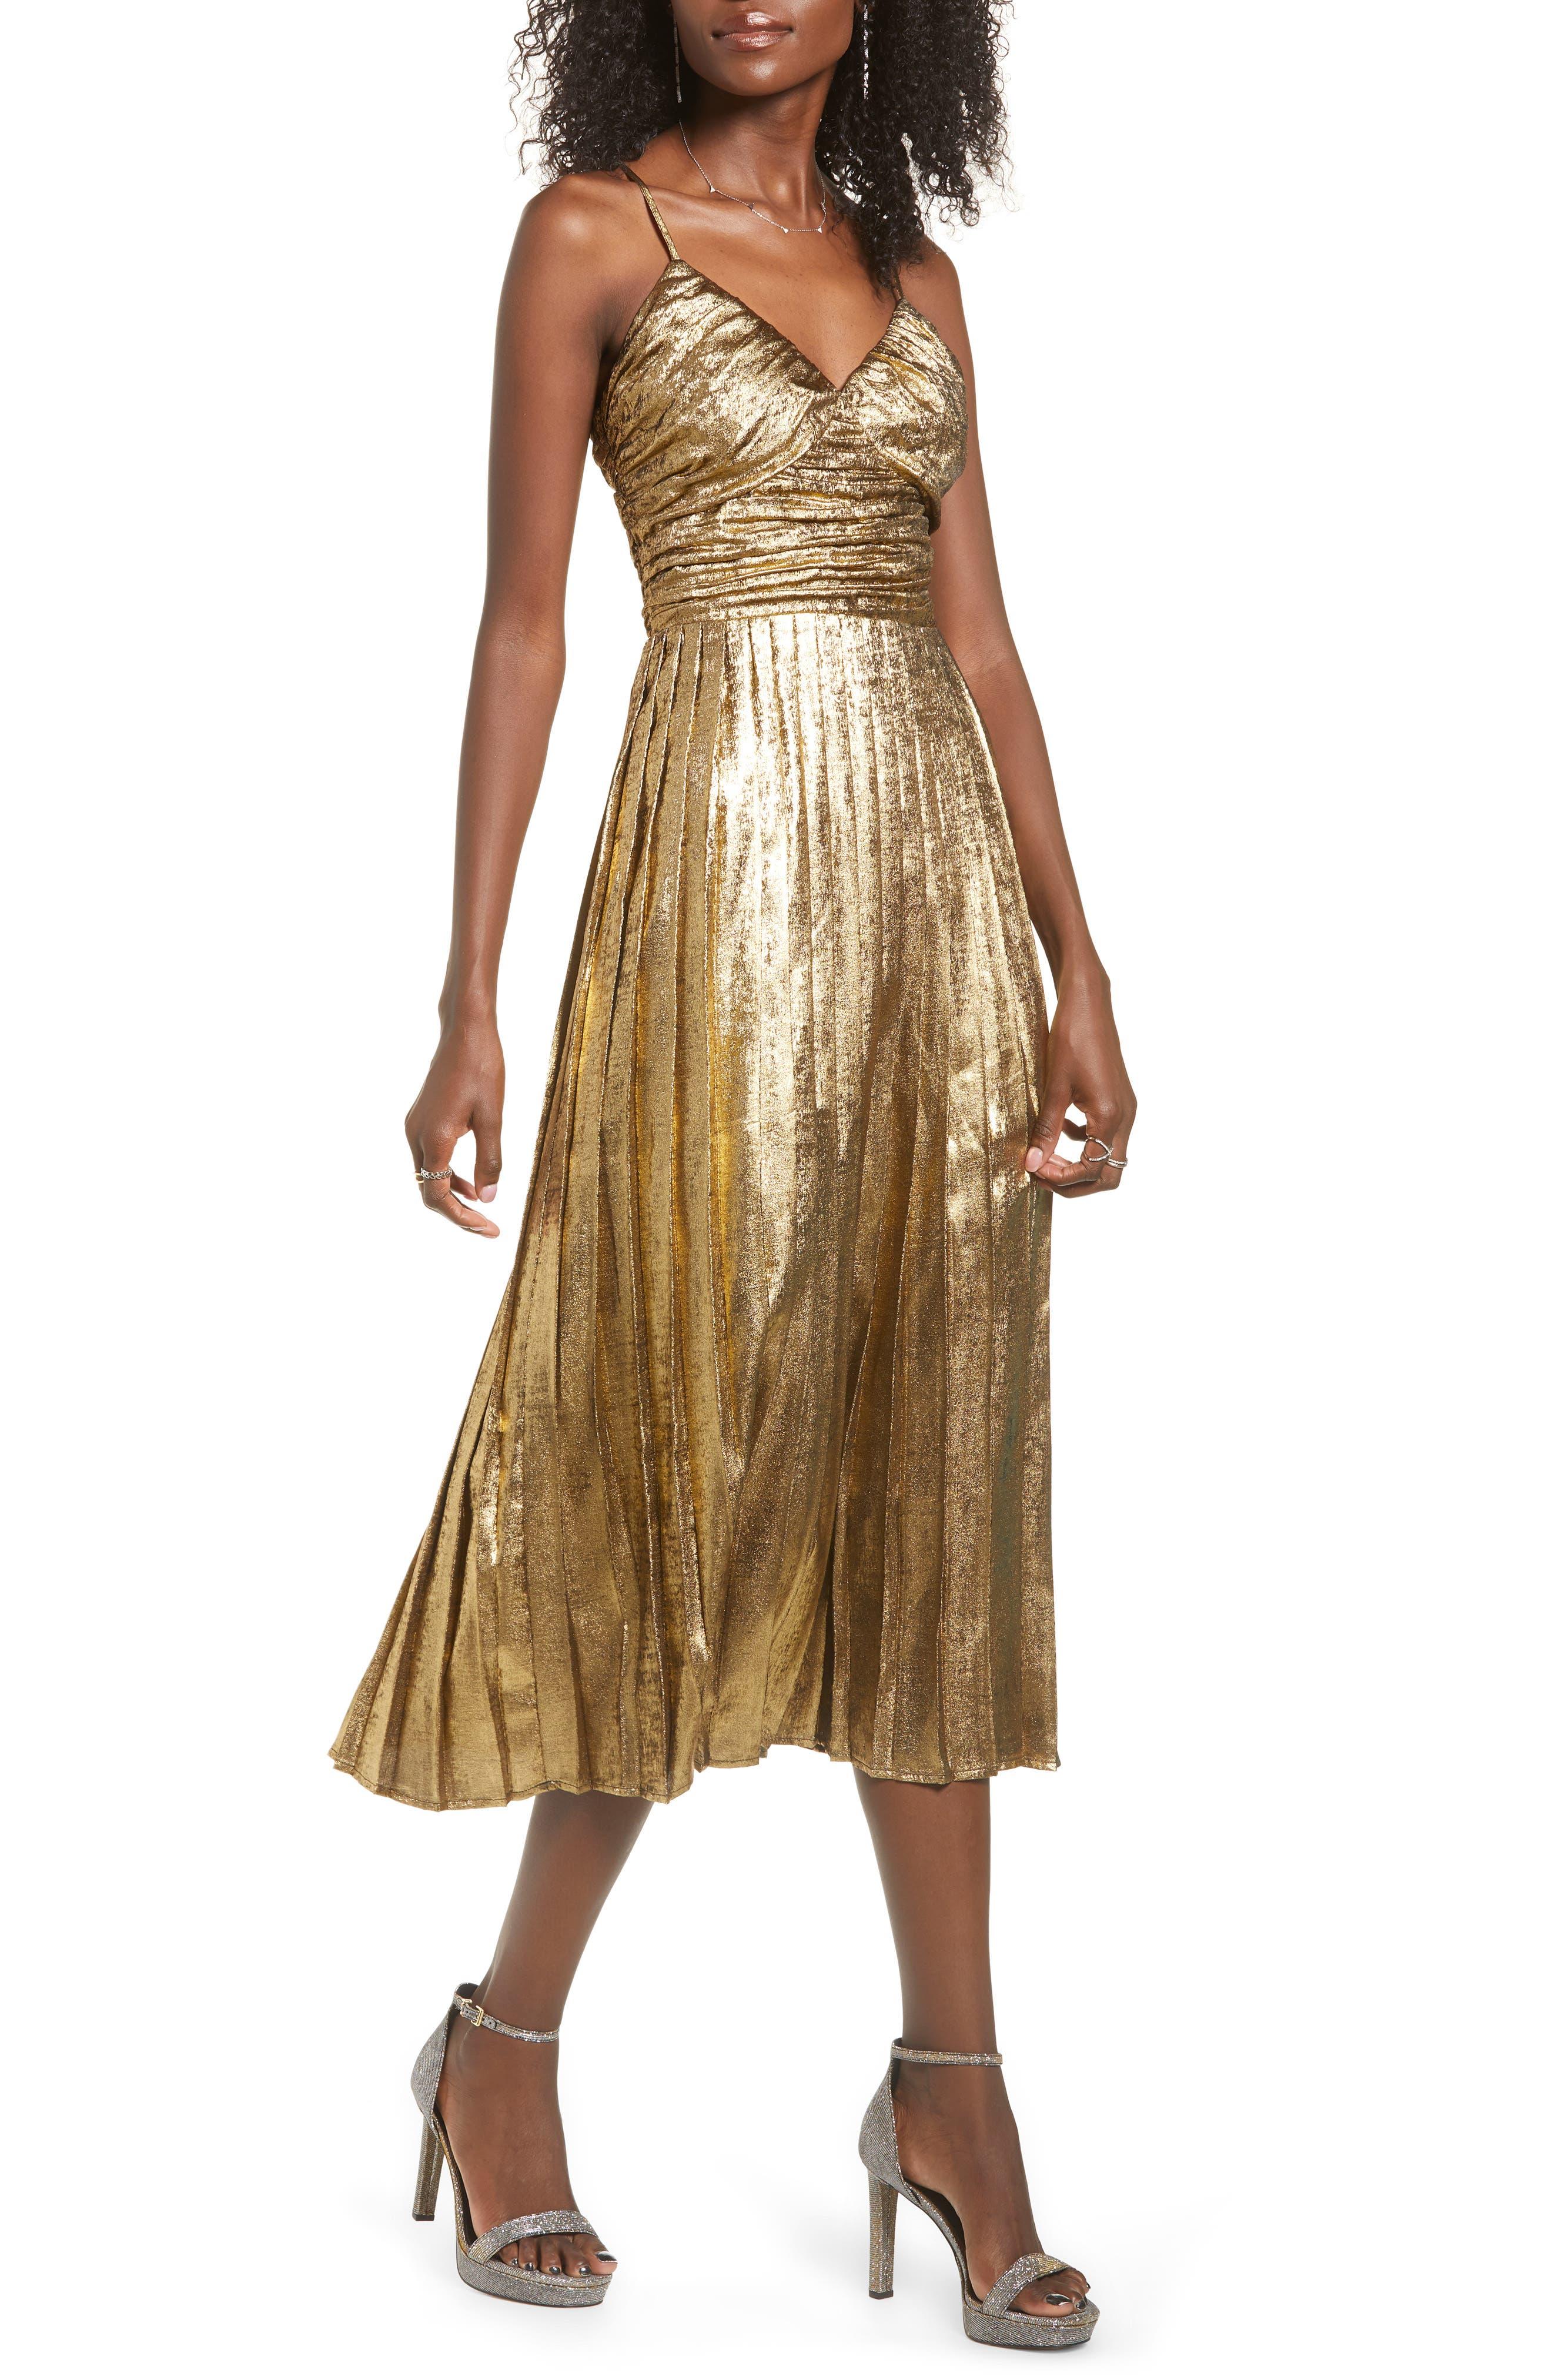 70s Prom, Formal, Evening, Party Dresses Womens J.o.a. Metallic Pleated Midi Dress $125.00 AT vintagedancer.com